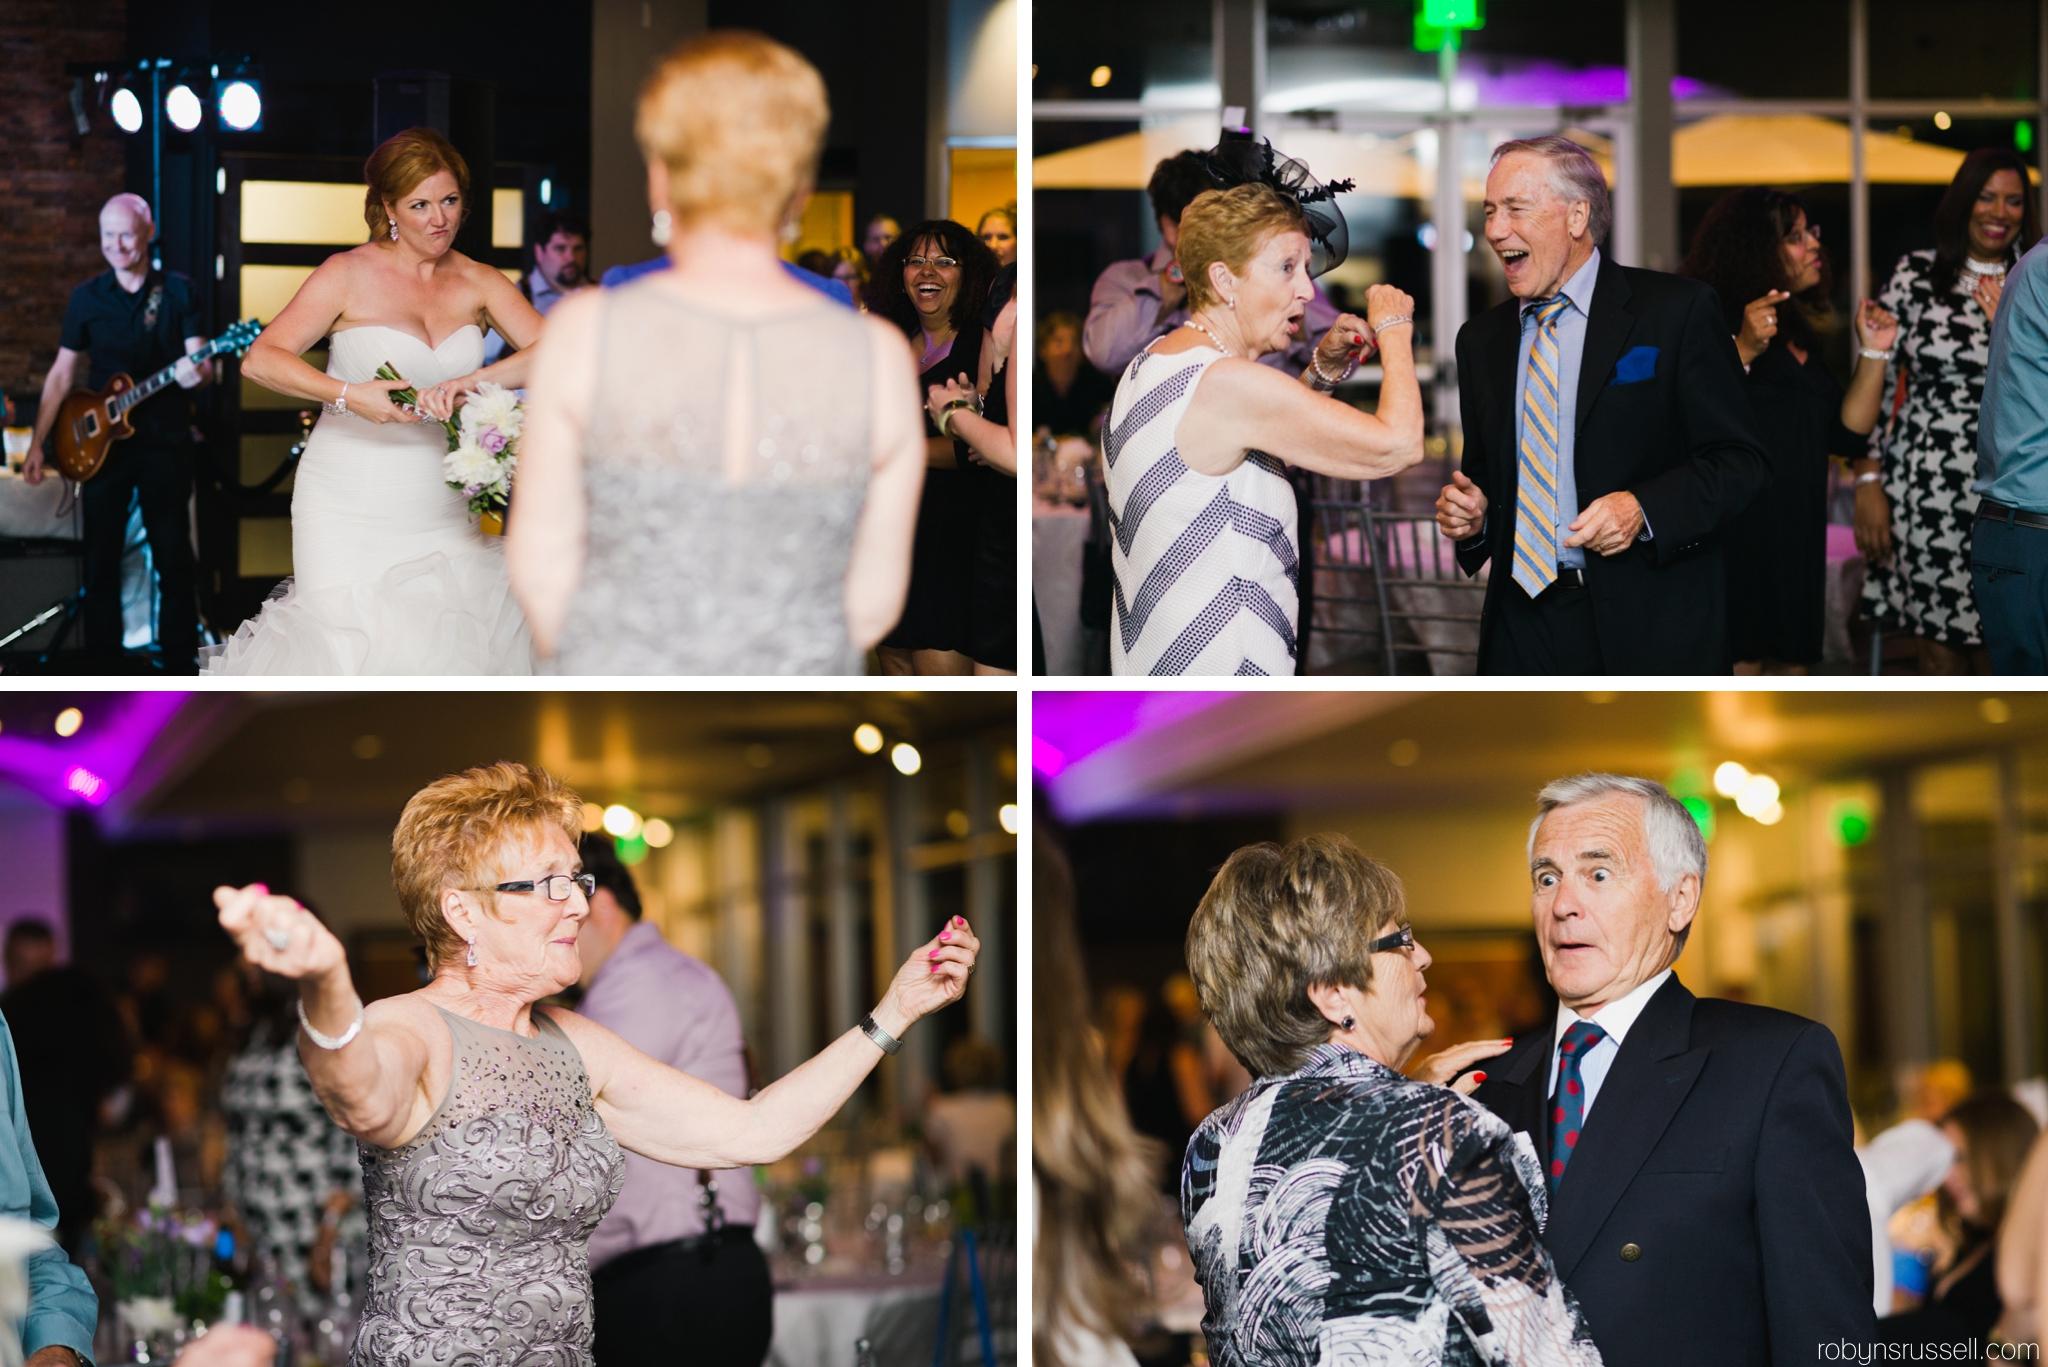 44-guests-dancing-at-wedding-in-oakville.jpg